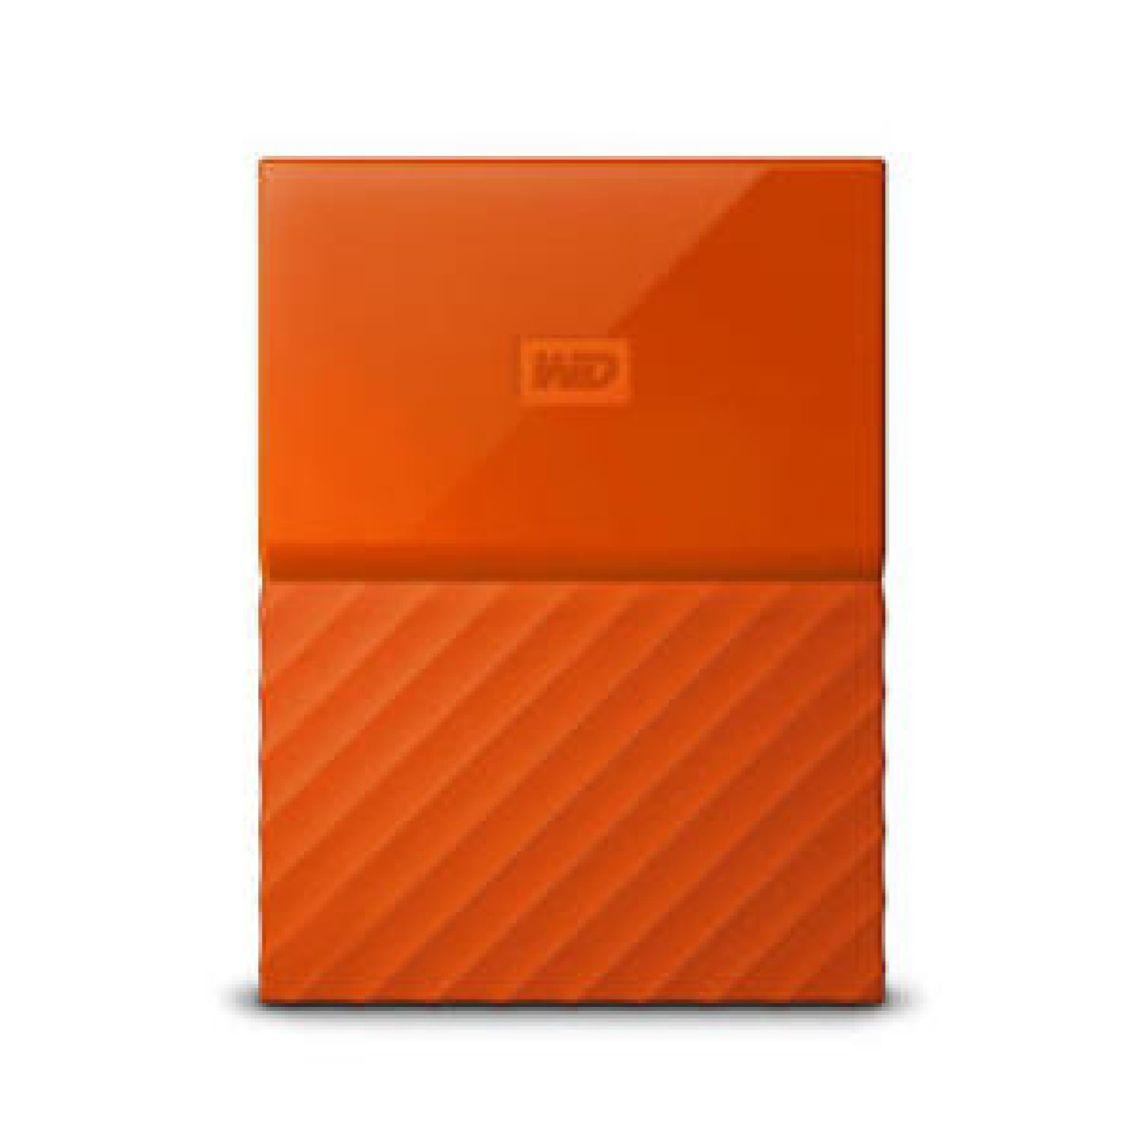 WD My Passport 2TB Orange Portable Hard Drive by Western Digital 3 year limit... 718037849836 | eBay